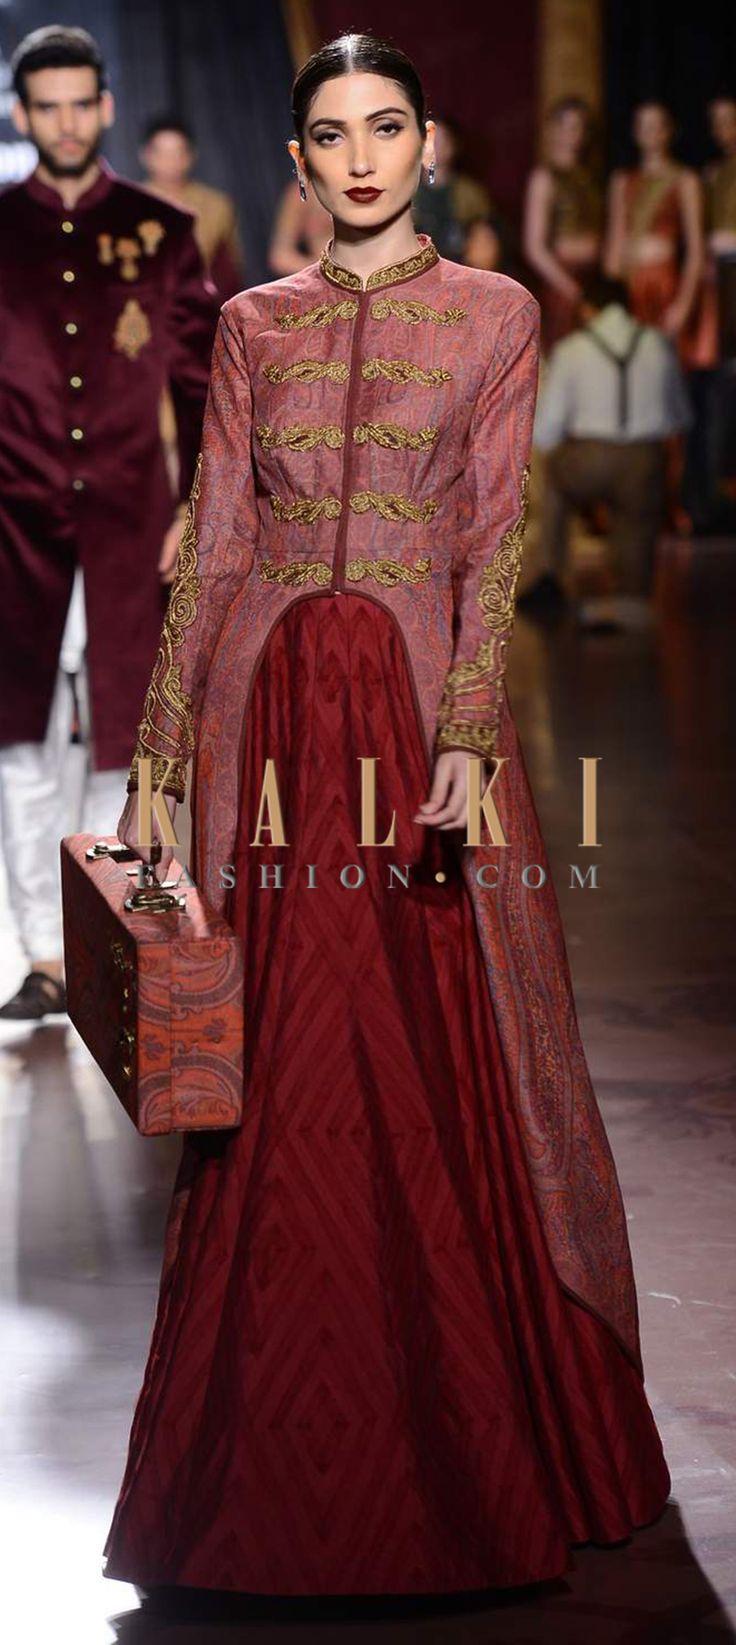 Click on the following link - http://www.kalkifashion.com/designers/harpreet-narula.html